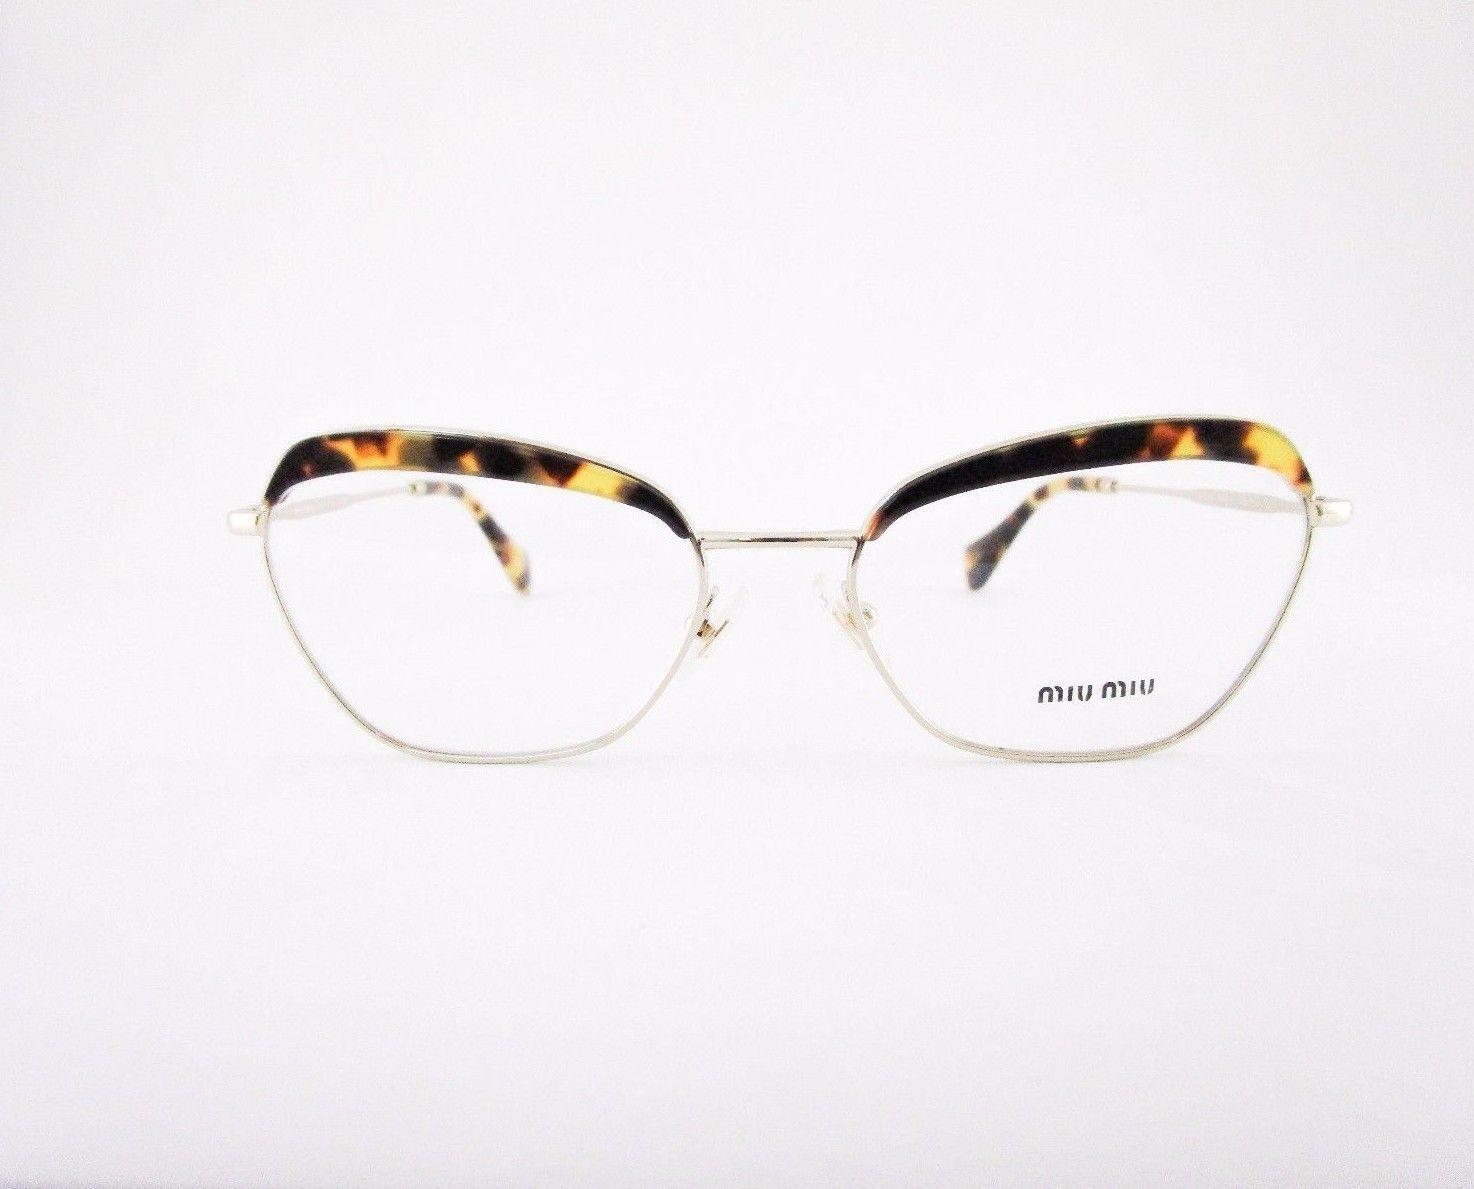 Miu Miu Reading Glasses: 5 listings